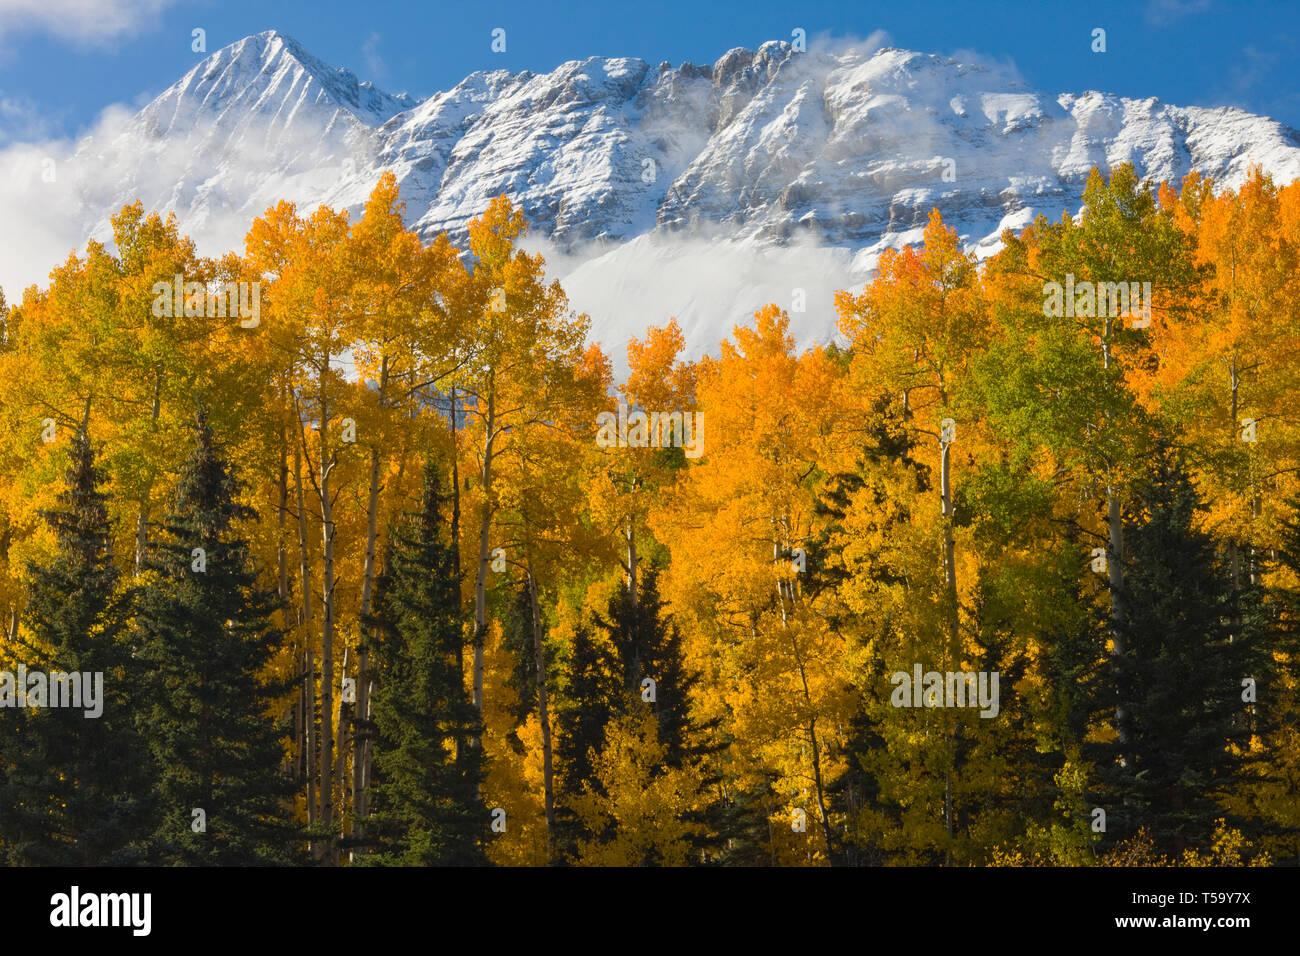 Wilson Peak dusted in snow near Telluride Colorado - Stock Image